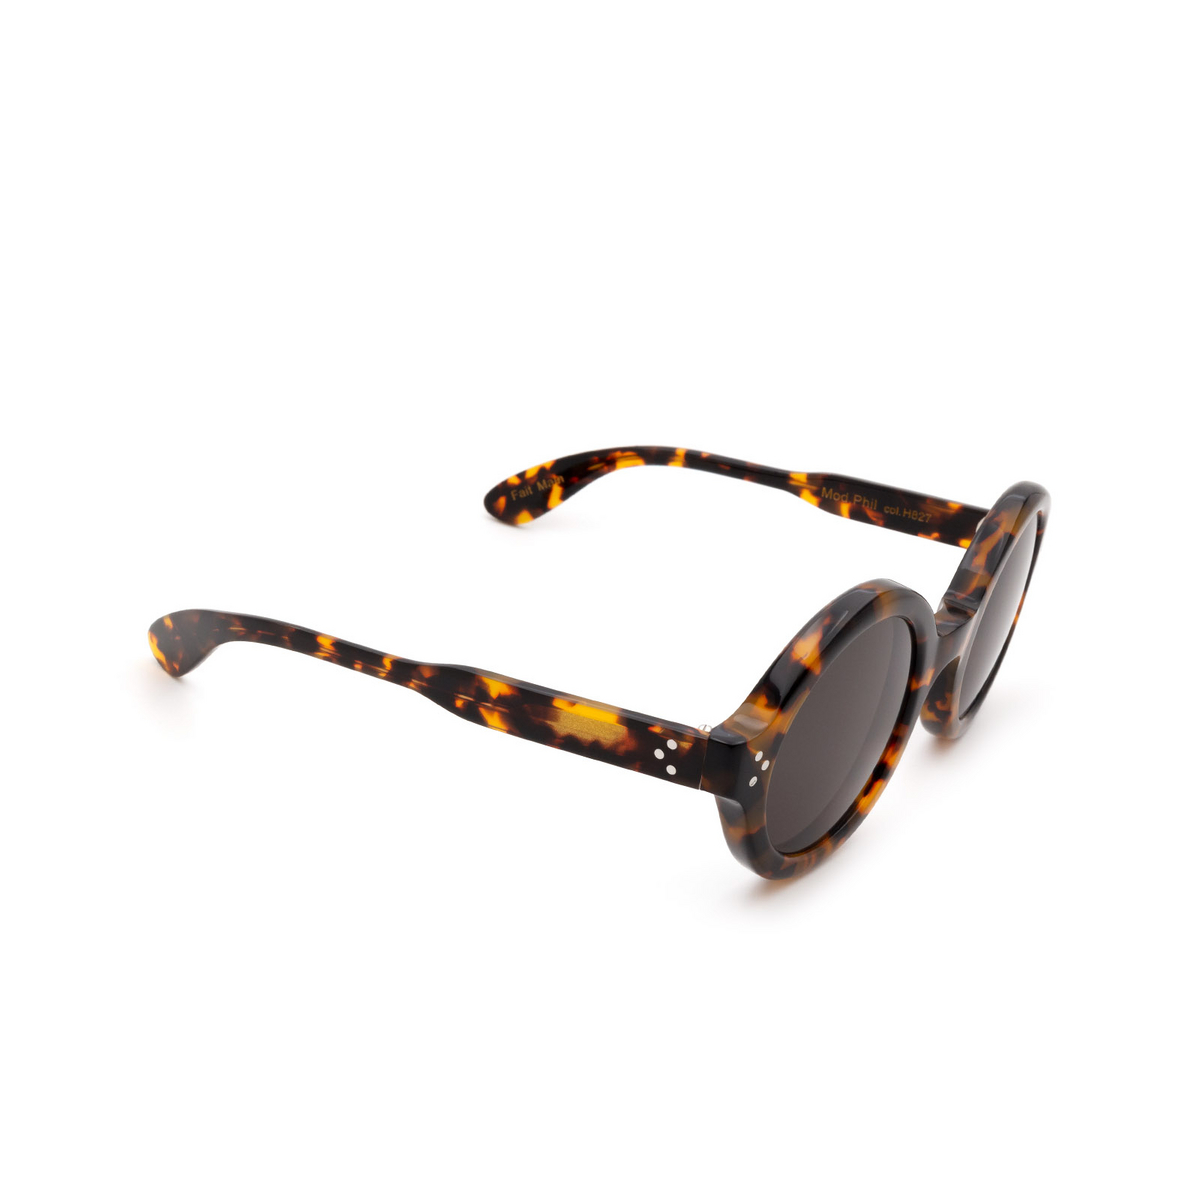 Lesca® Round Sunglasses: Phil Sun color Marble Tortoise H827 - three-quarters view.